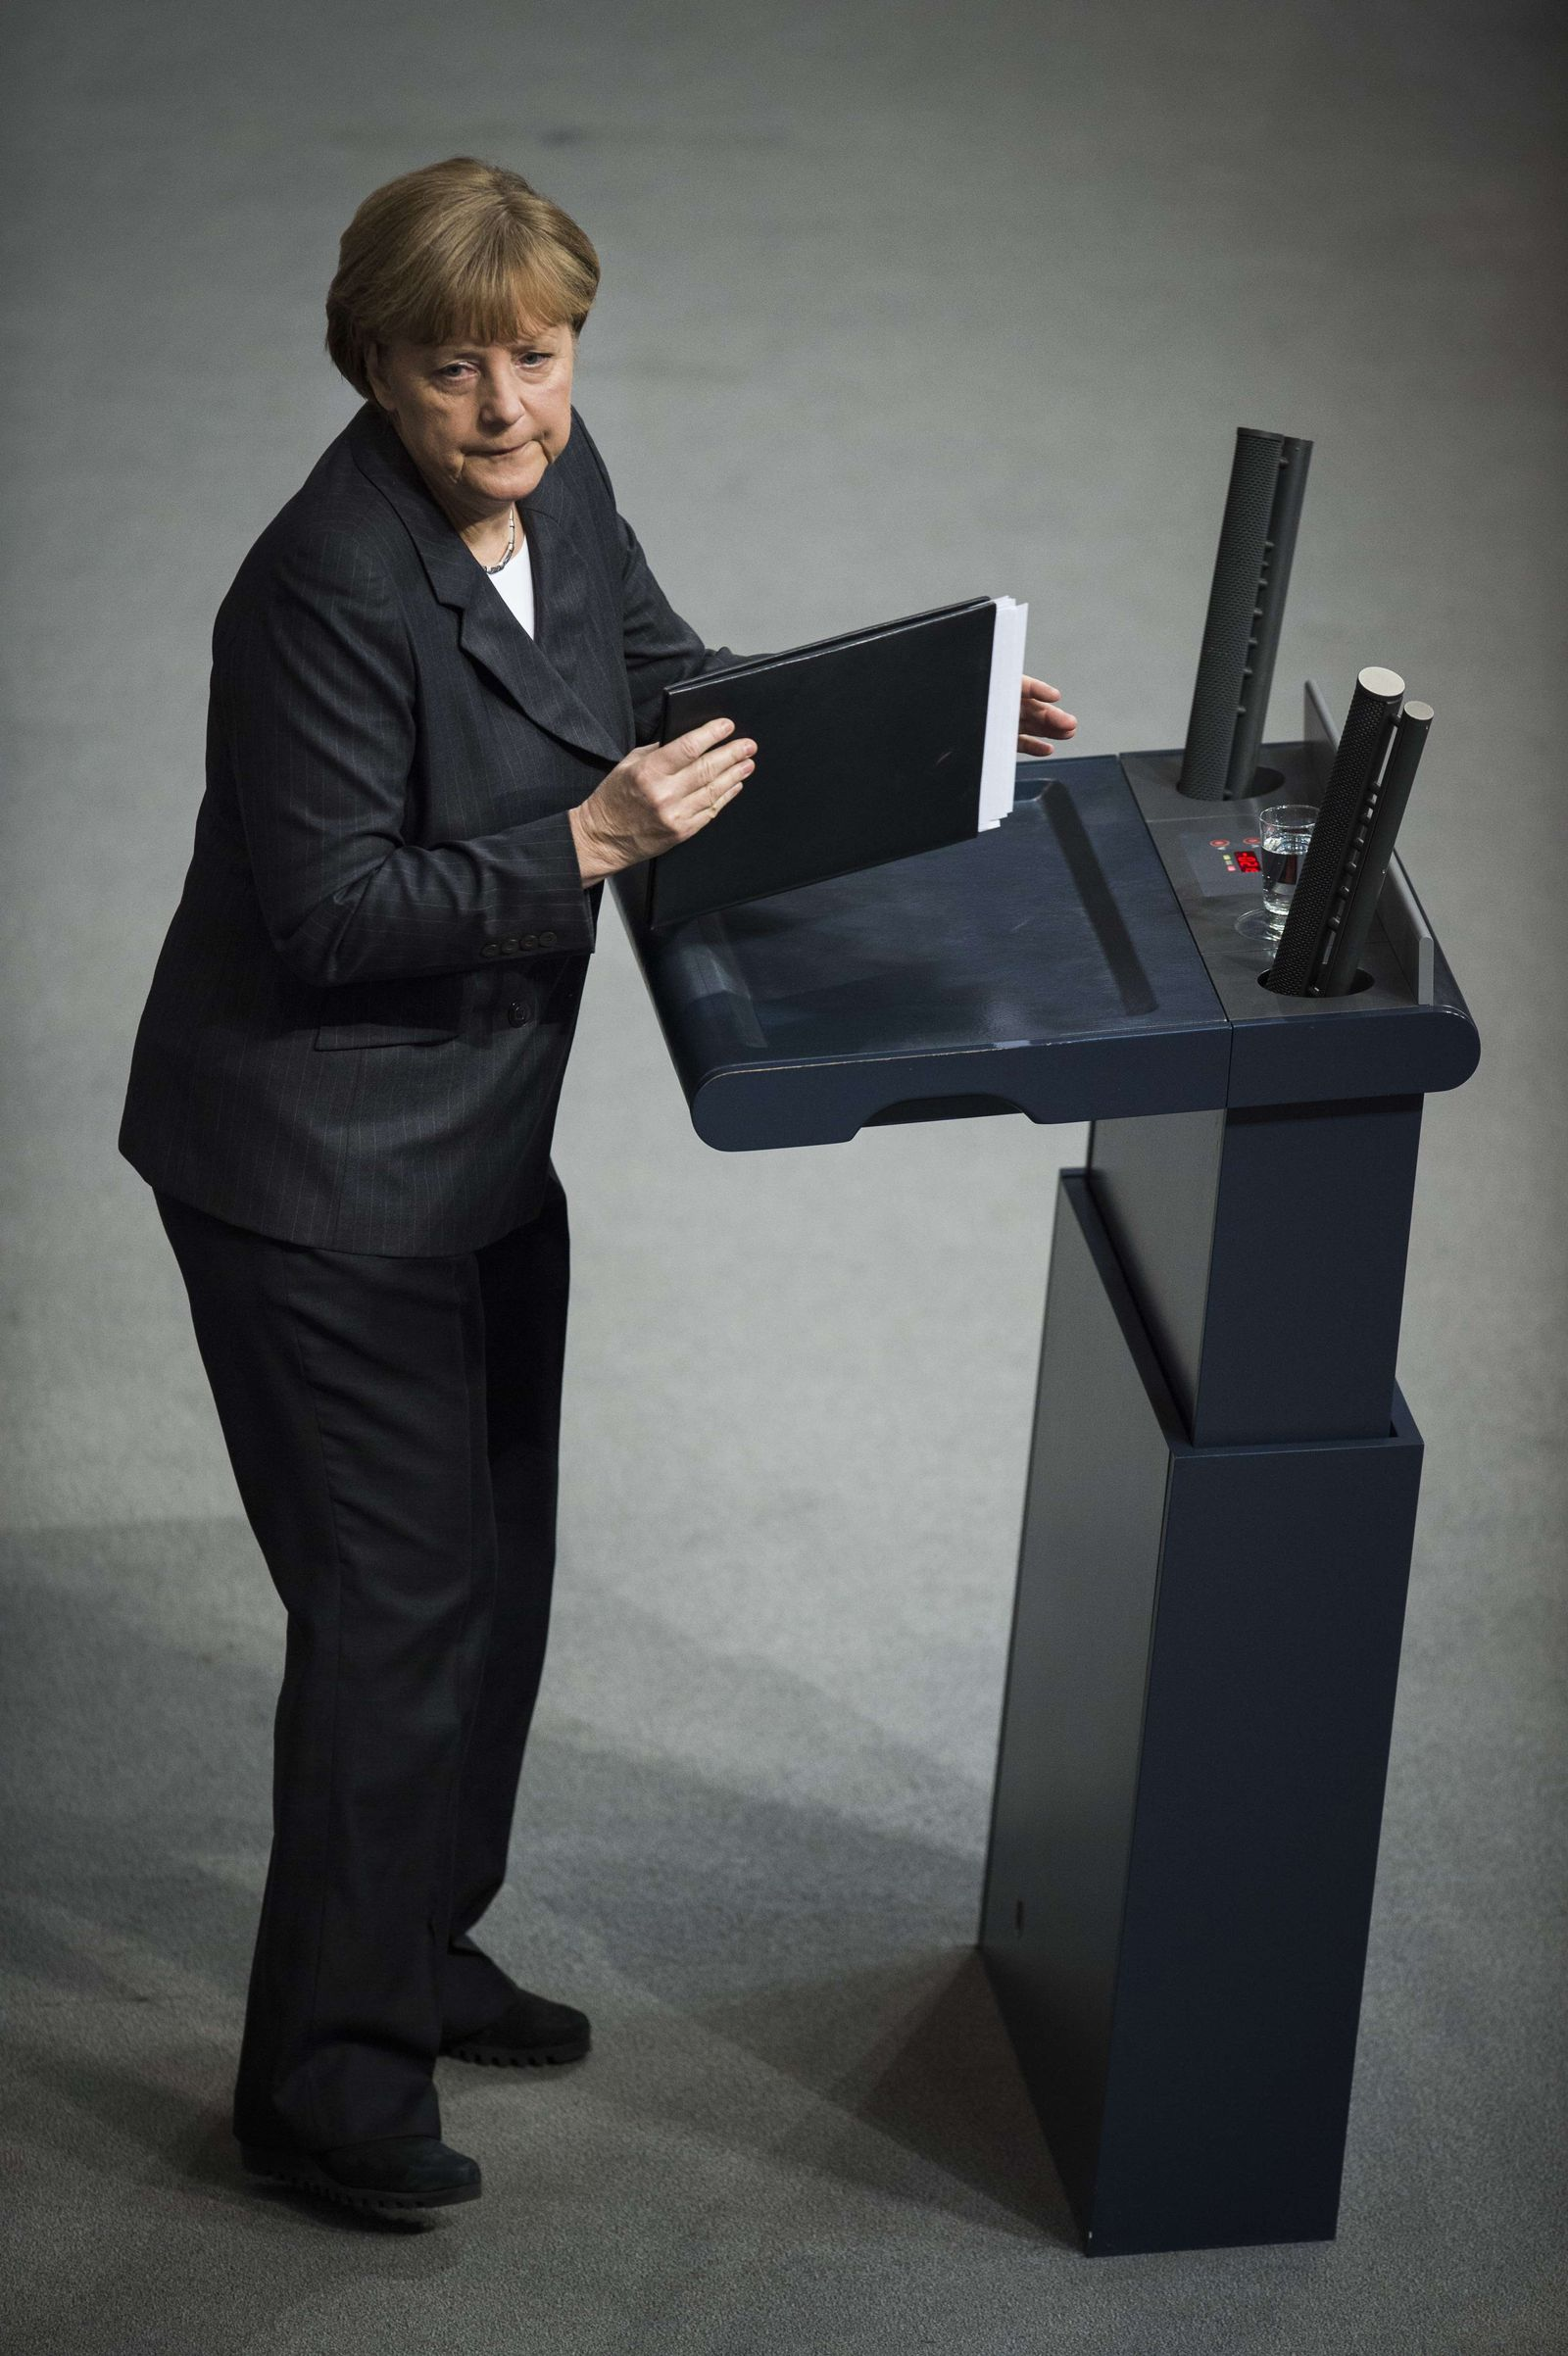 GERMANY-POLITICS-PARLIAMENT-FRANCE-ATTACKS-CHARLIE-HEBDO